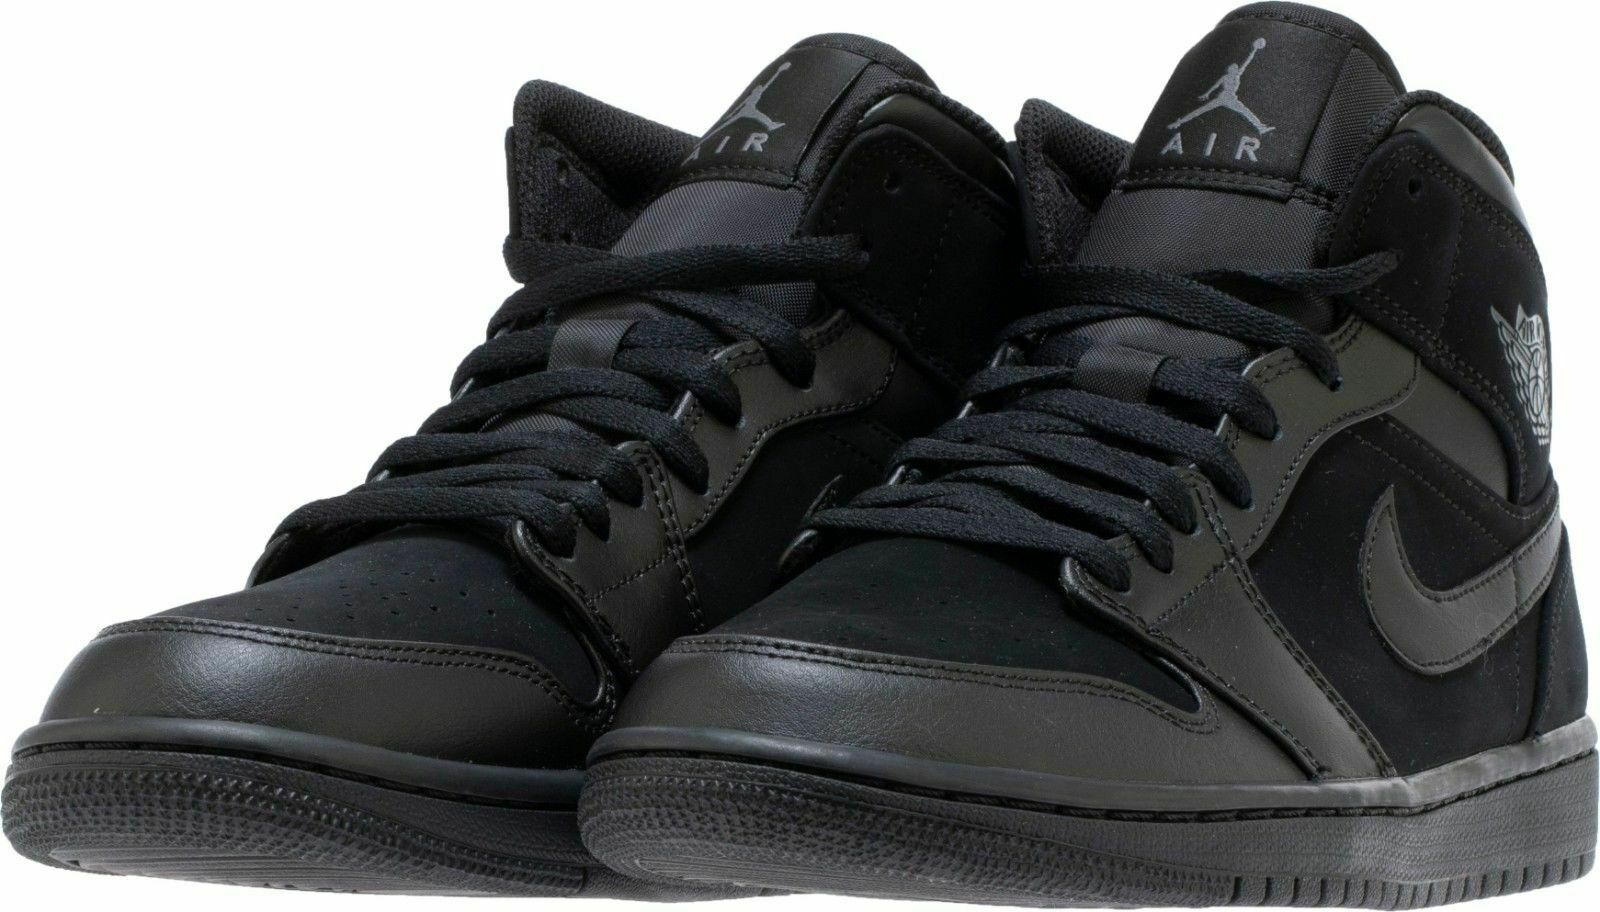 uk availability a343a 5d1ce Nike Air Jordan 1 Mid Basketball Shoes Black Dark Gray 554724-050 Men's NEW